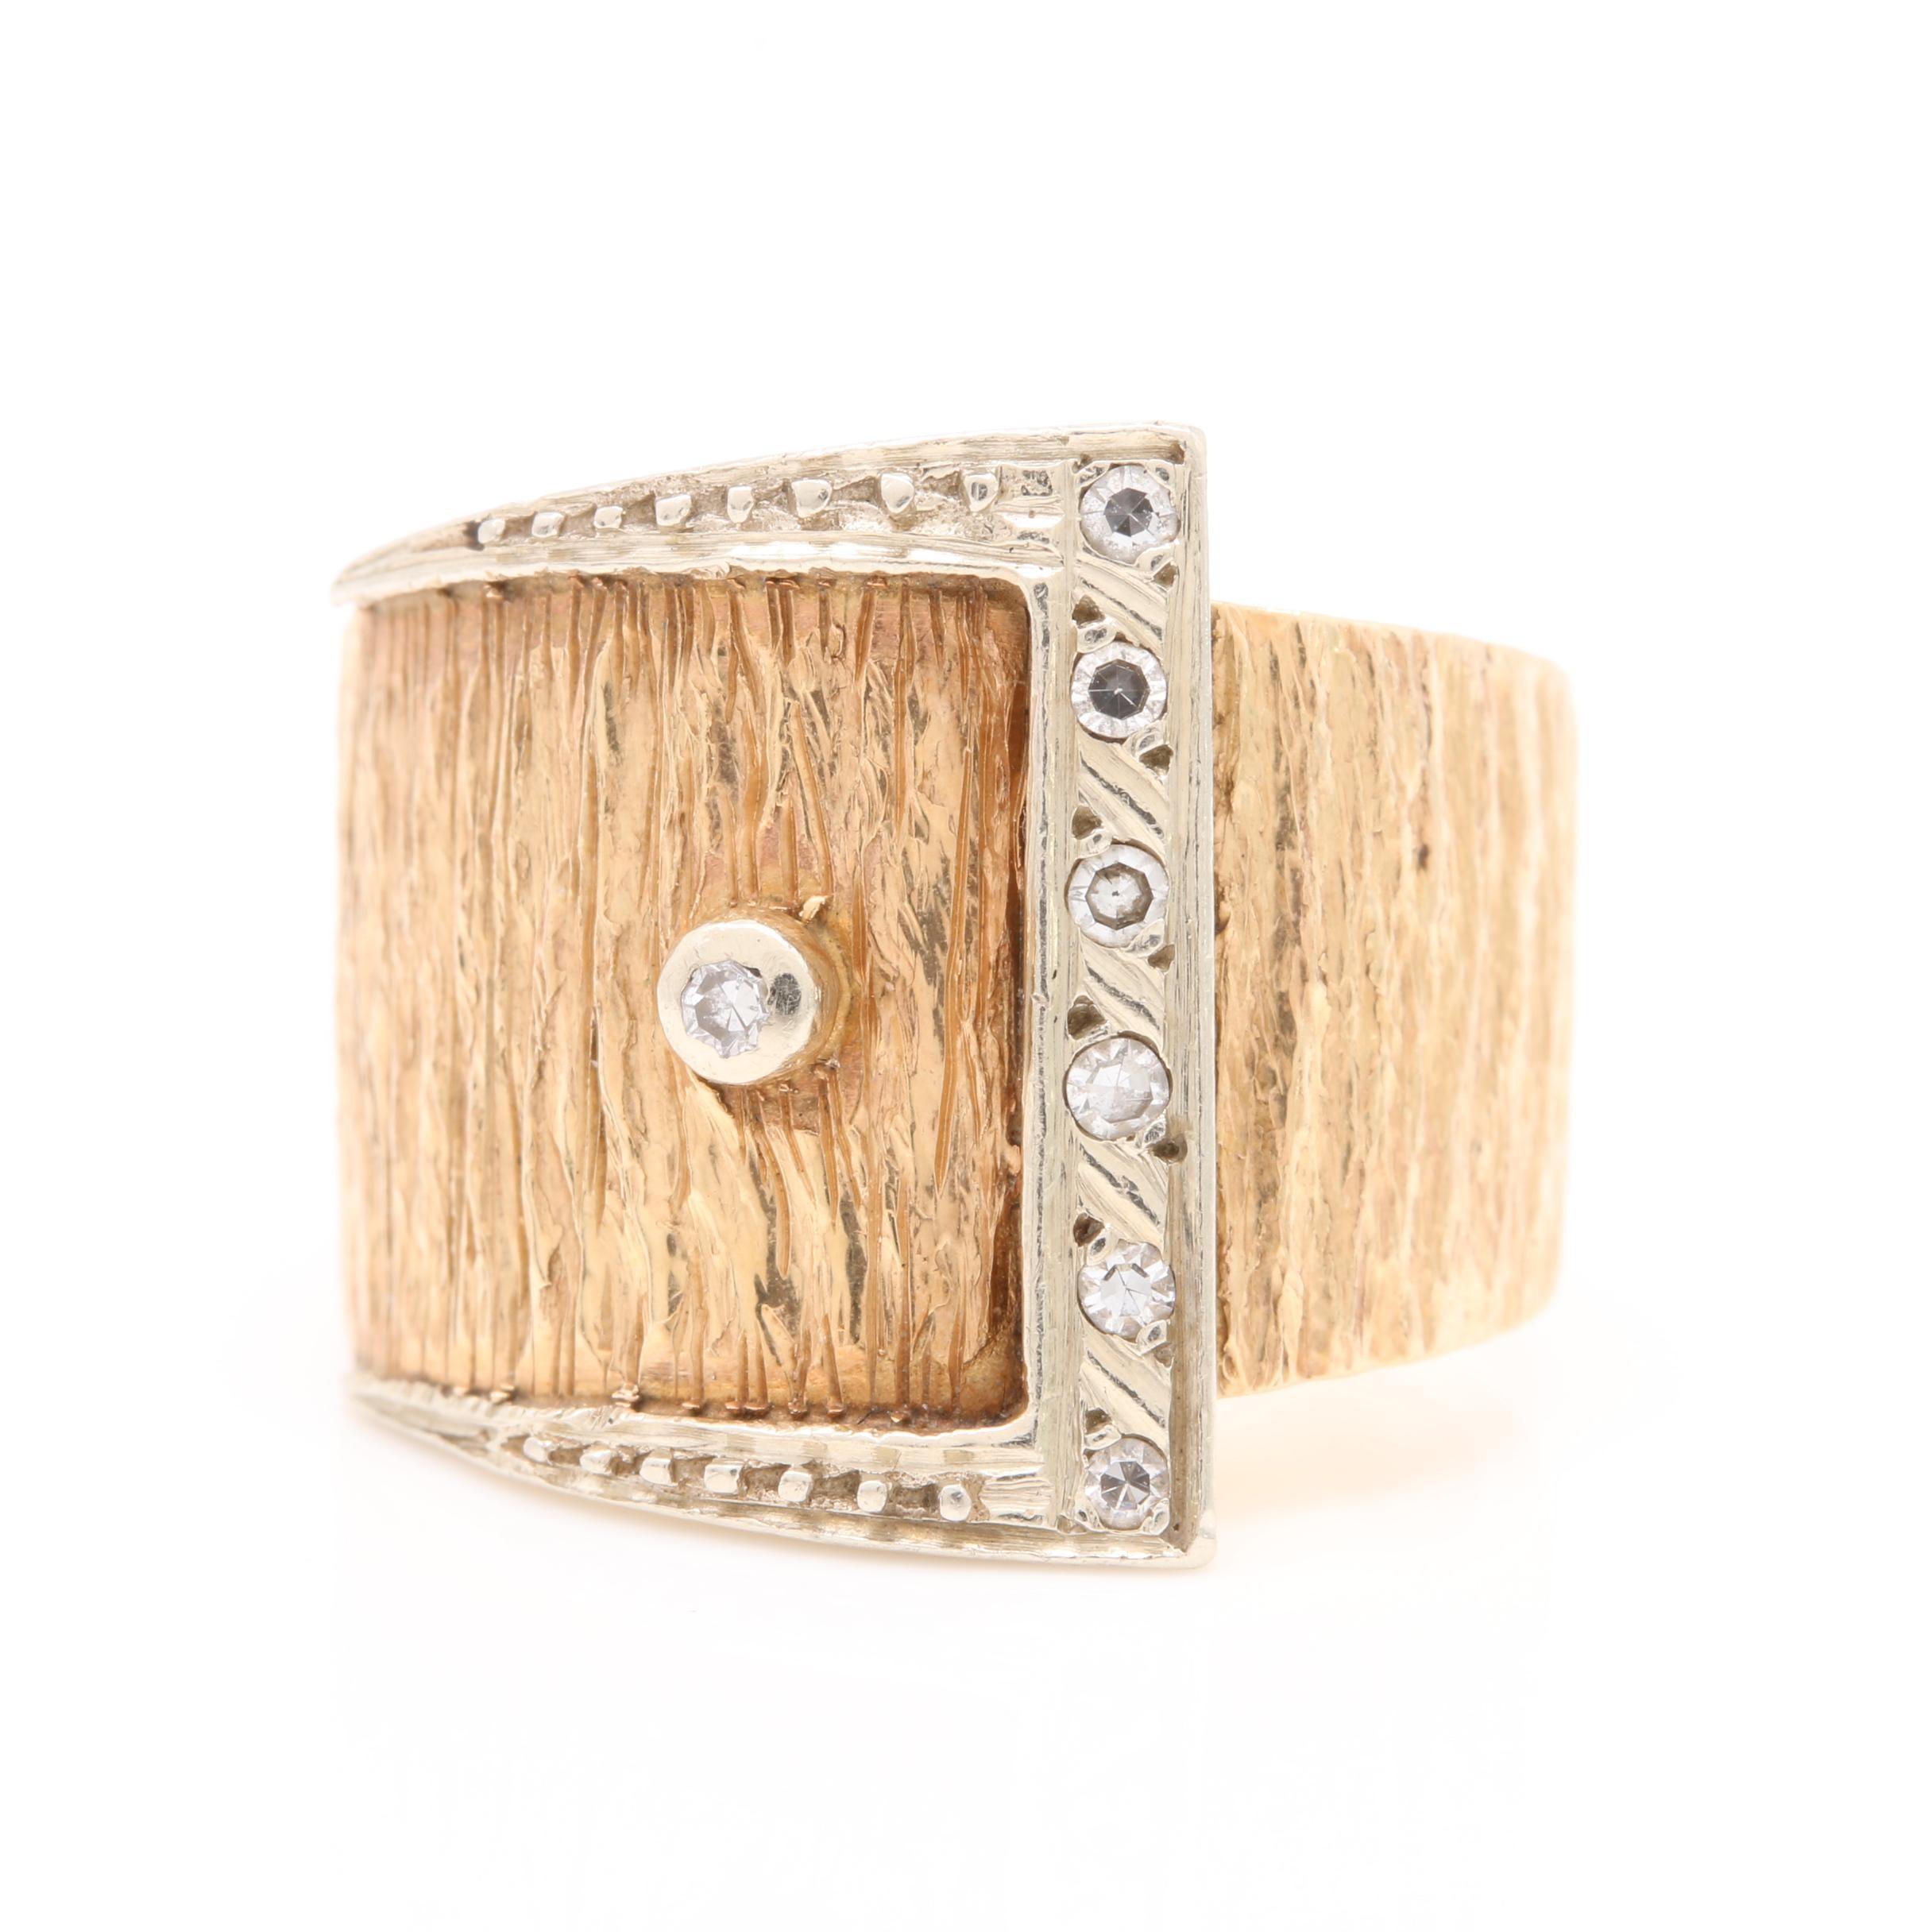 14K Yellow Gold Diamond Belt Buckle Ring